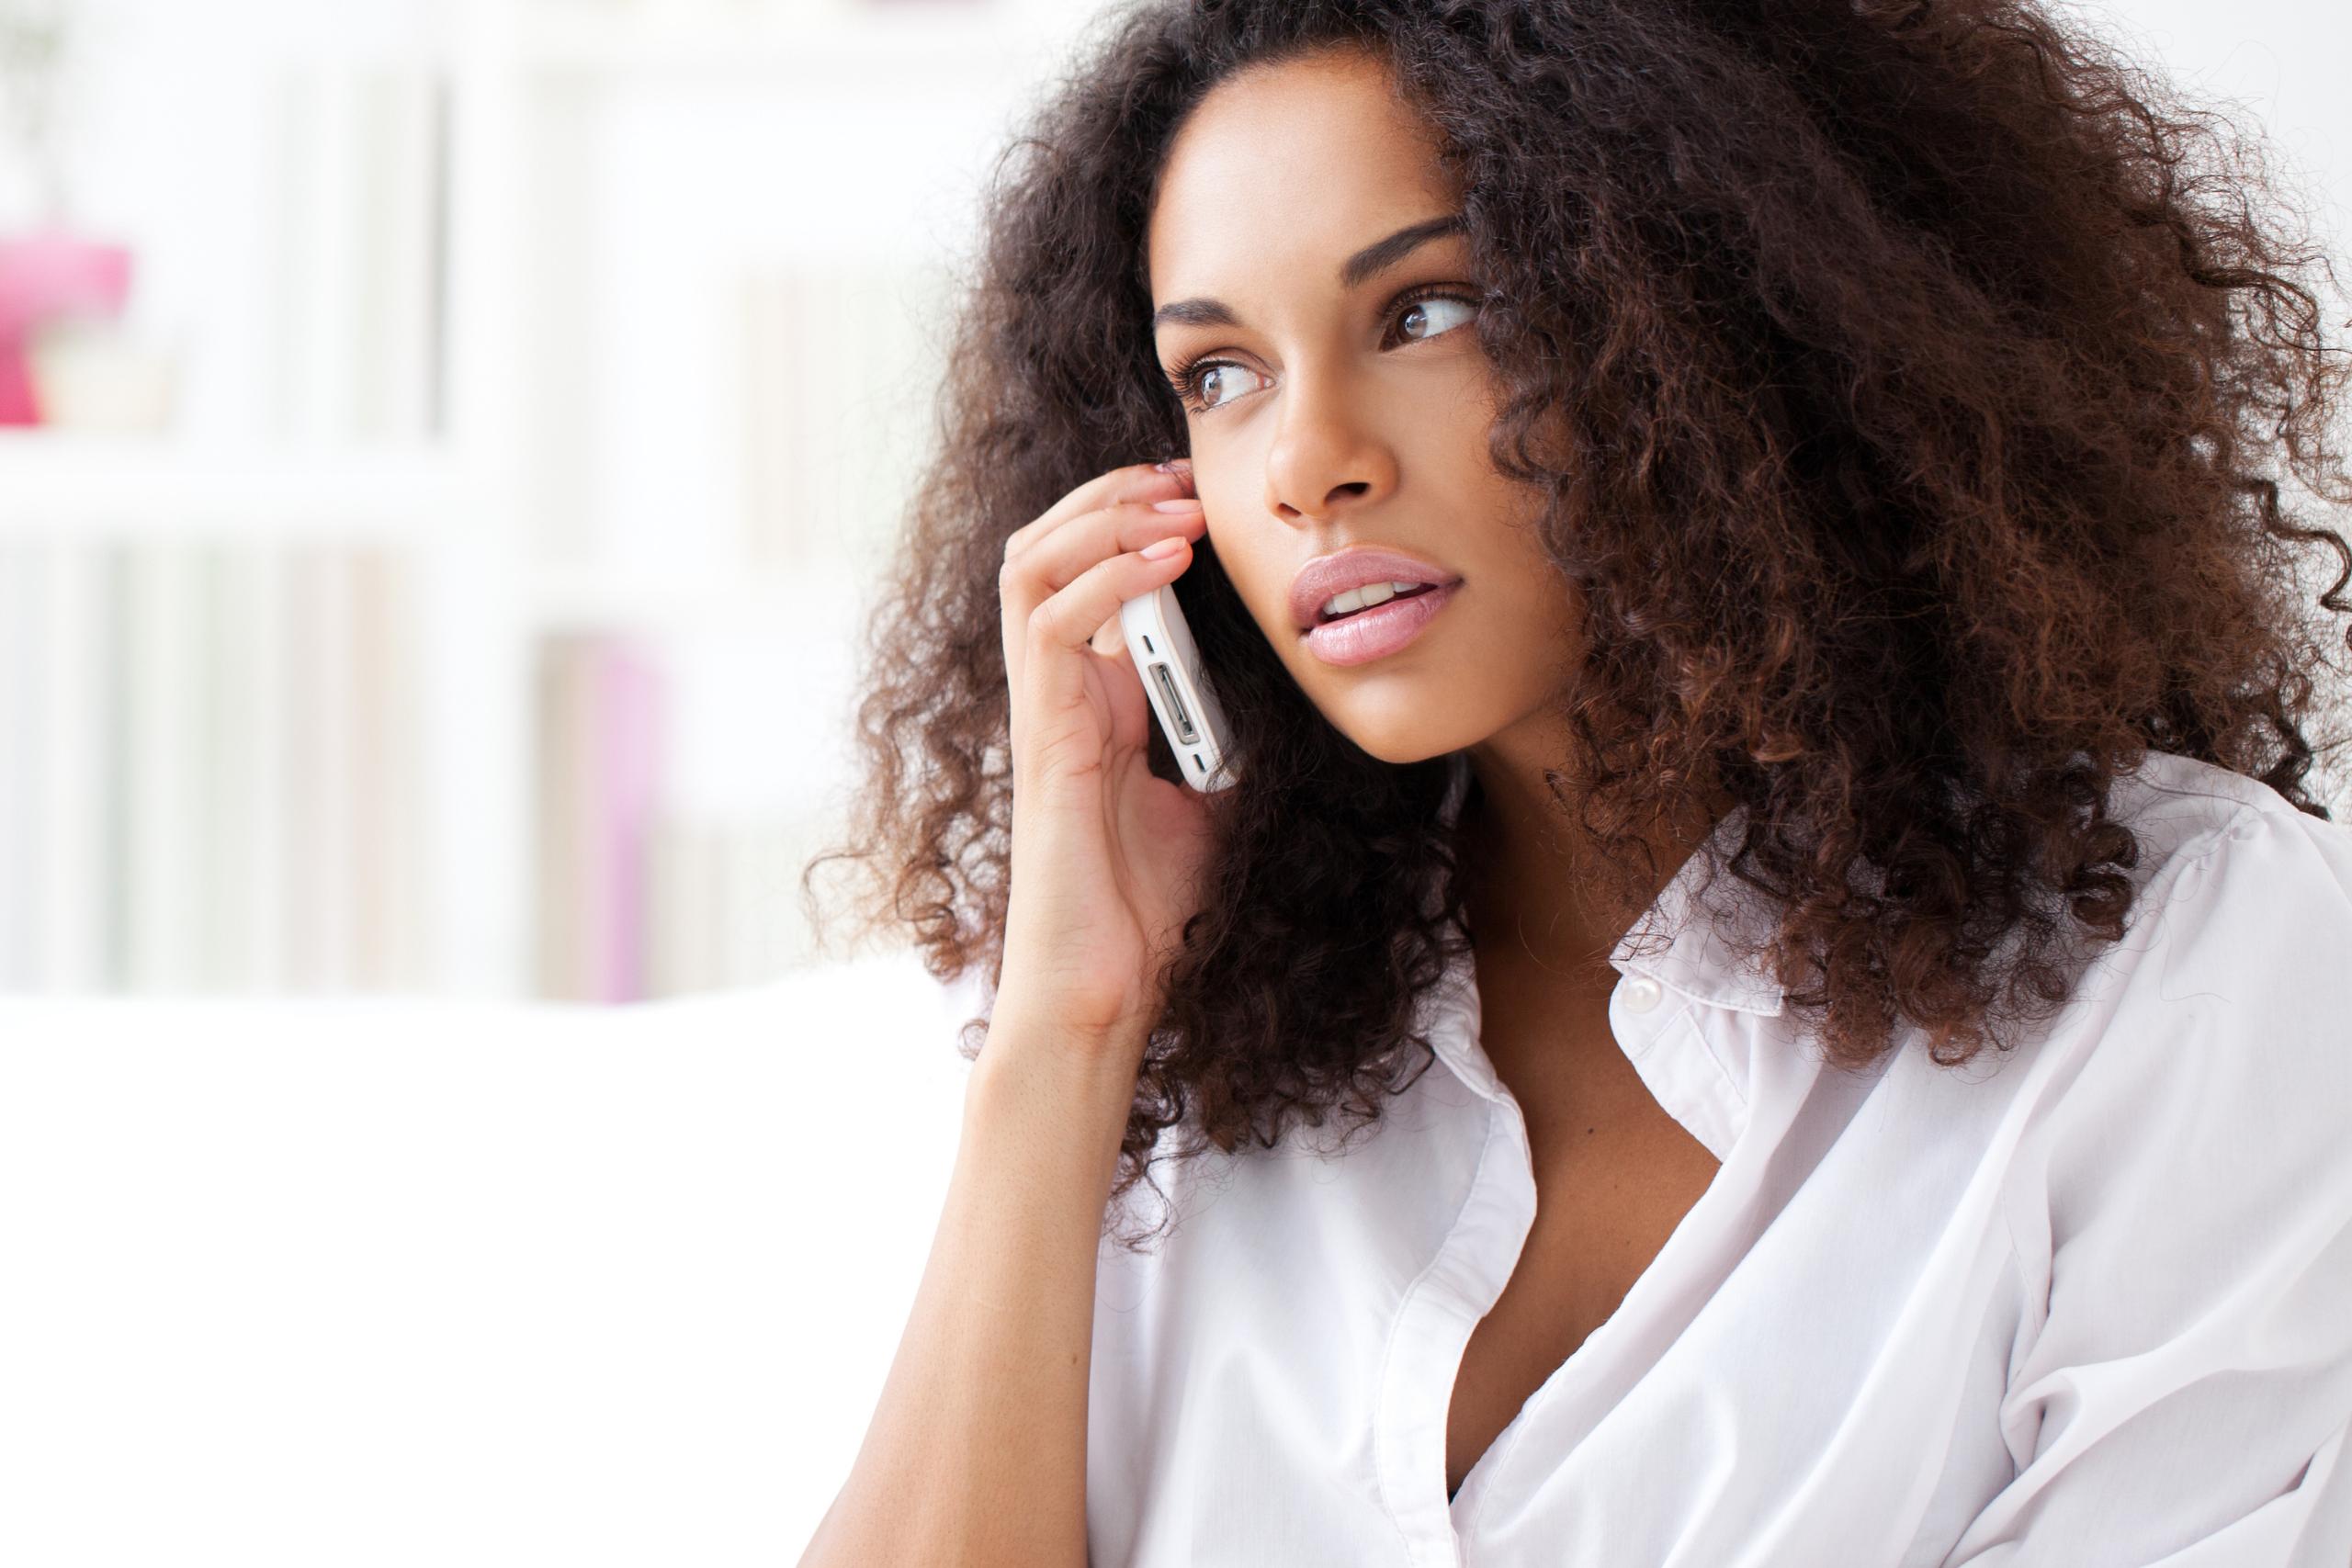 psychologische beratung telefon